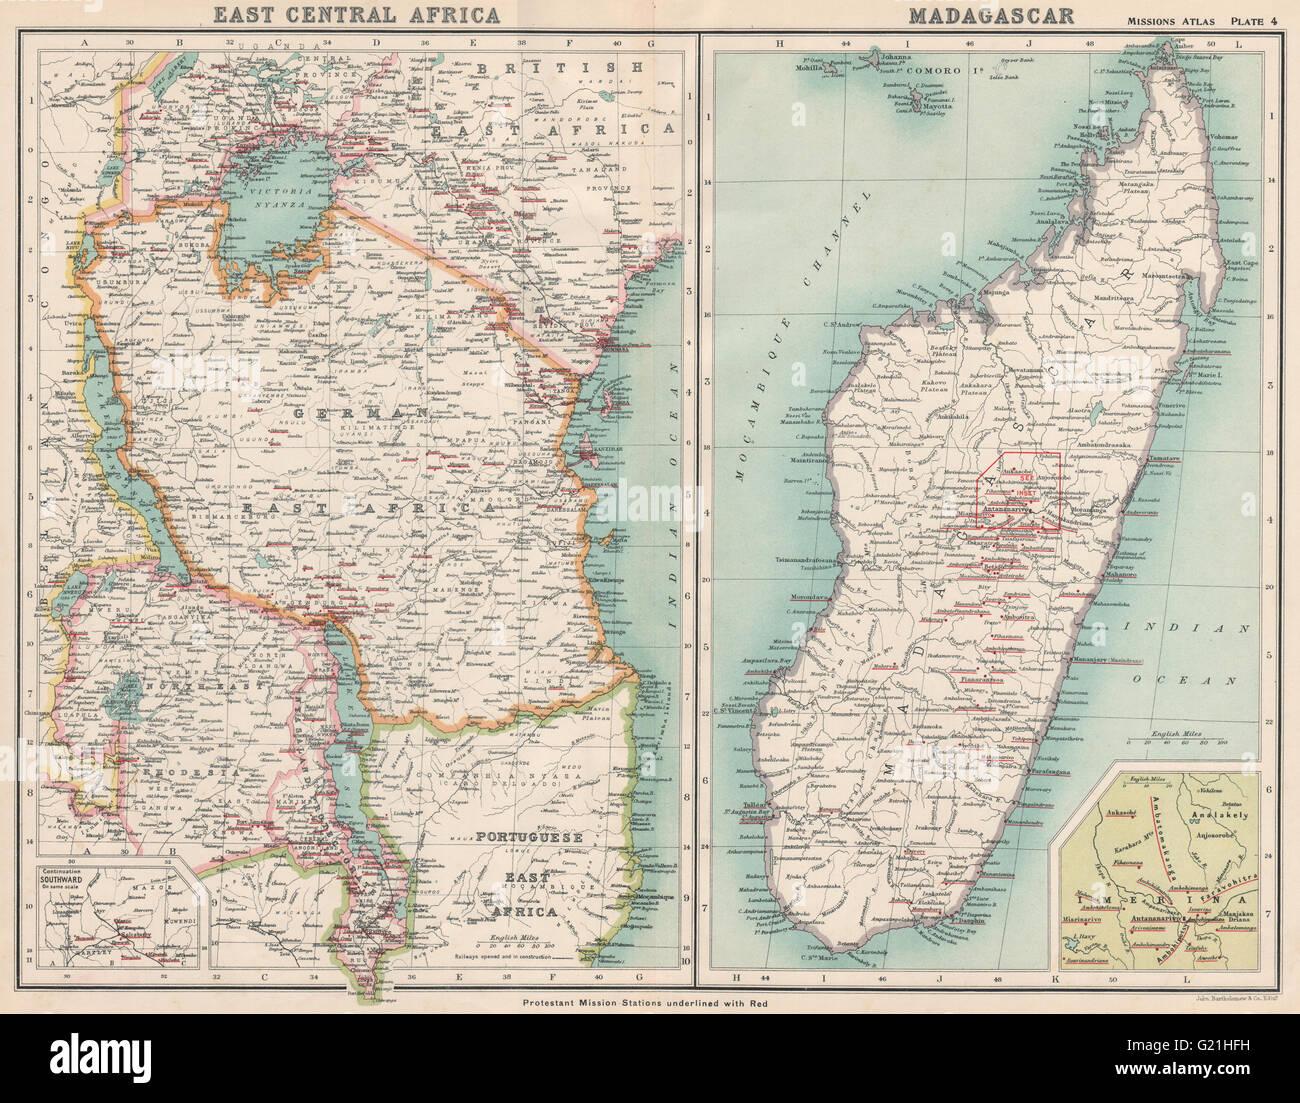 German east africa madagascar protestant missions tanzania kenya german east africa madagascar protestant missions tanzania kenya 1911 map gumiabroncs Gallery